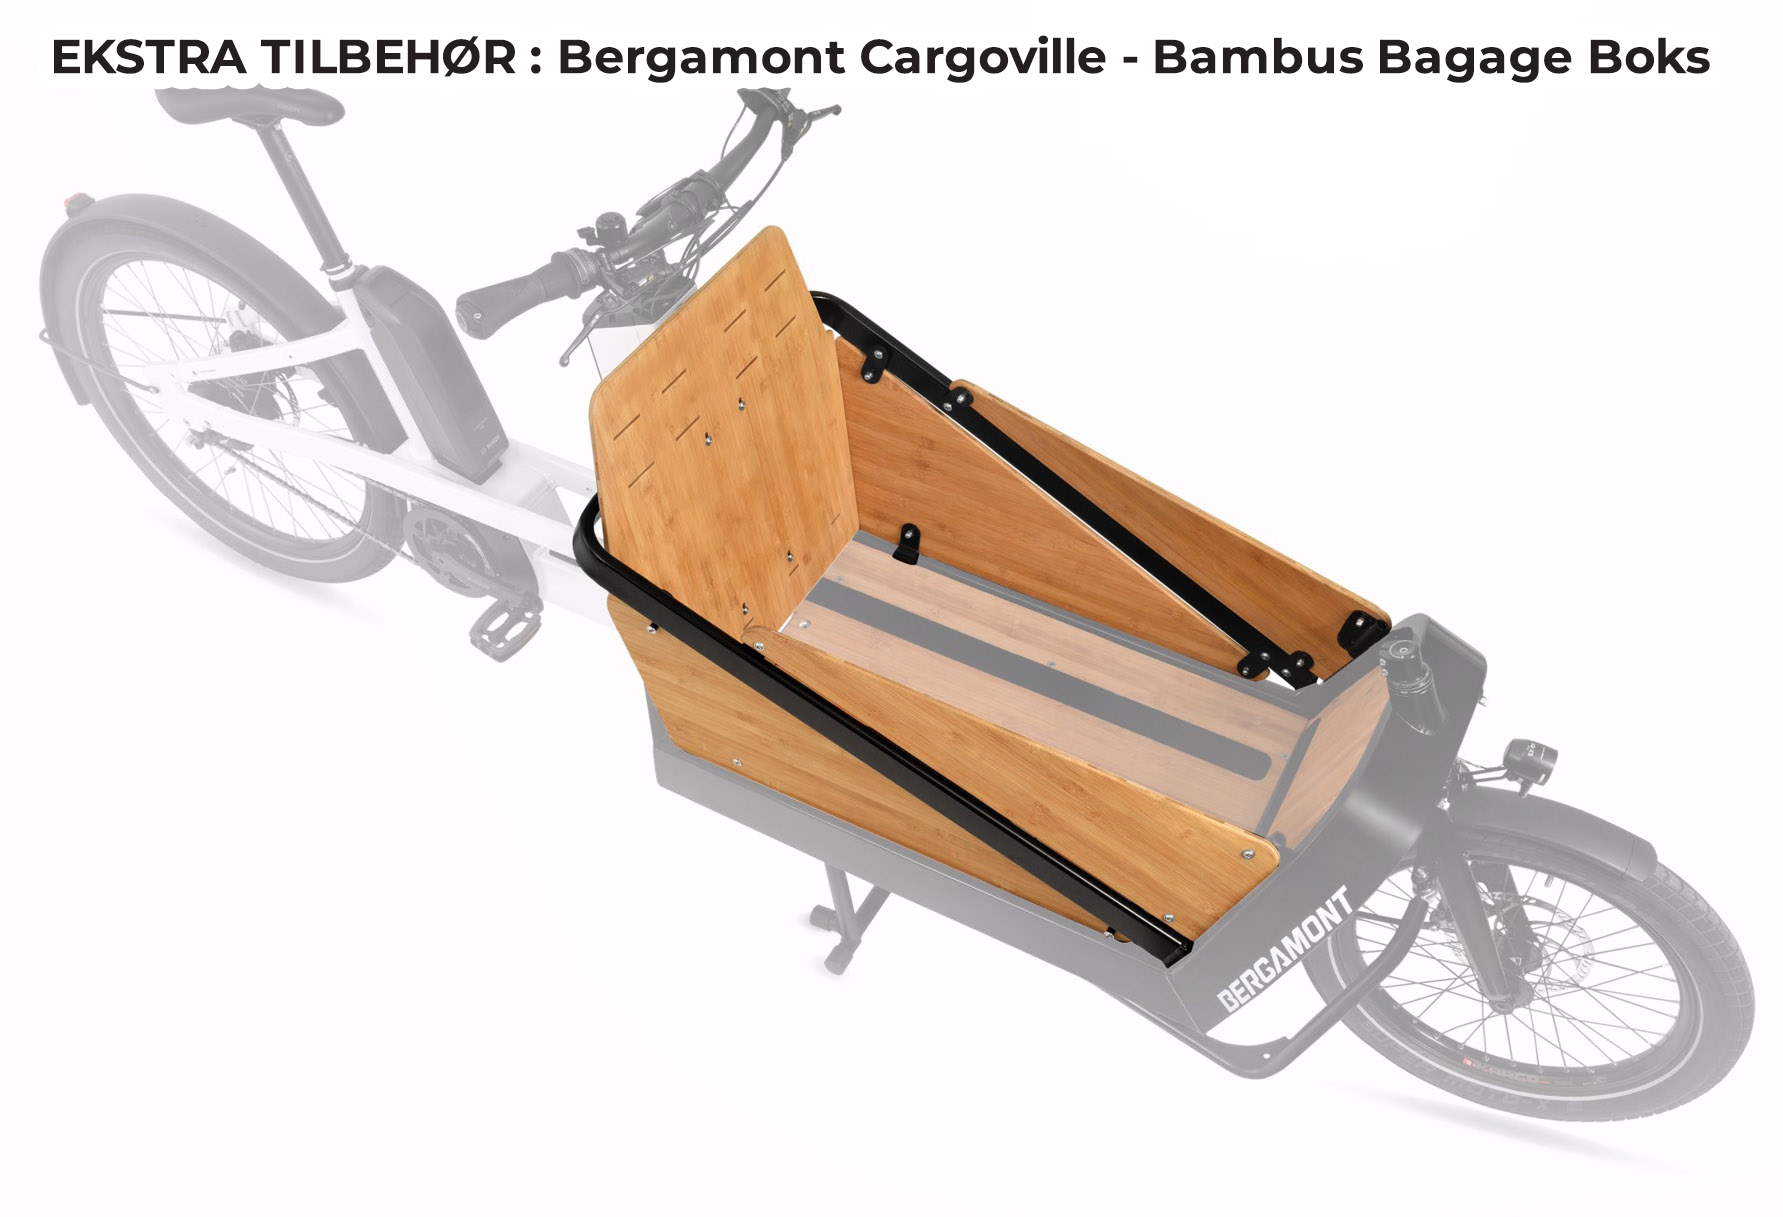 Bergamont E-cargoville LJ 70 Ladcykel